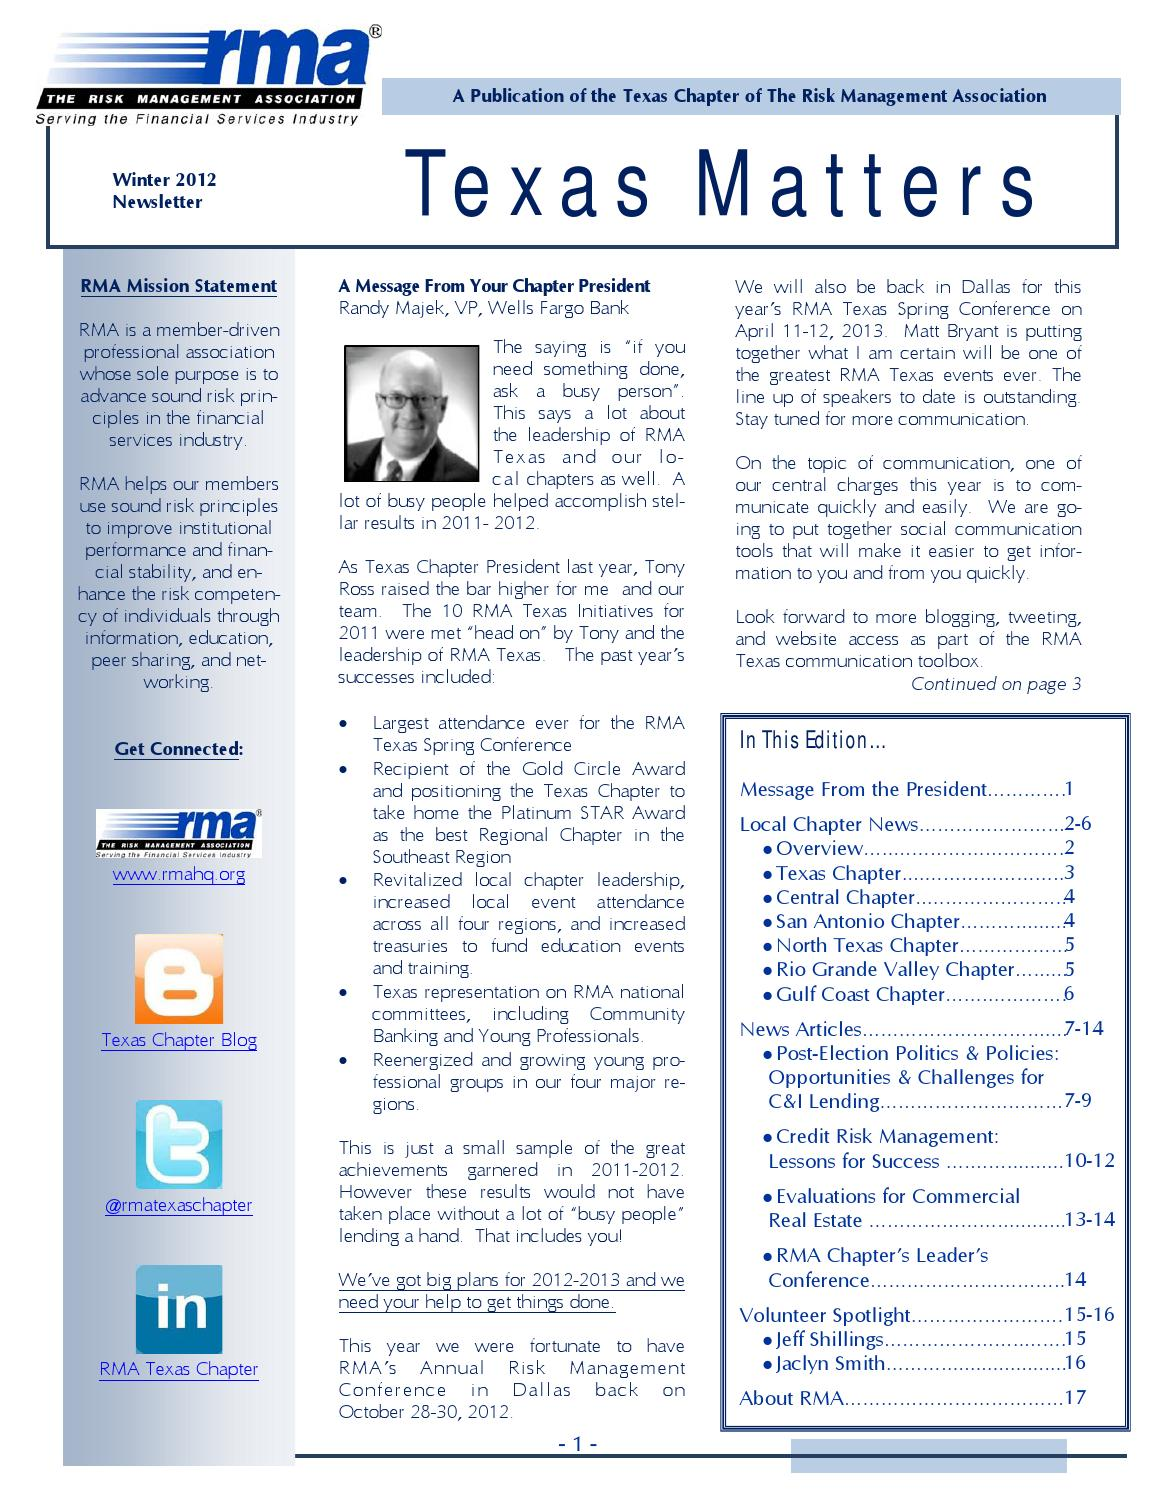 Rma Texas Chapter Winter 2012 Newsletter By Rma Texas